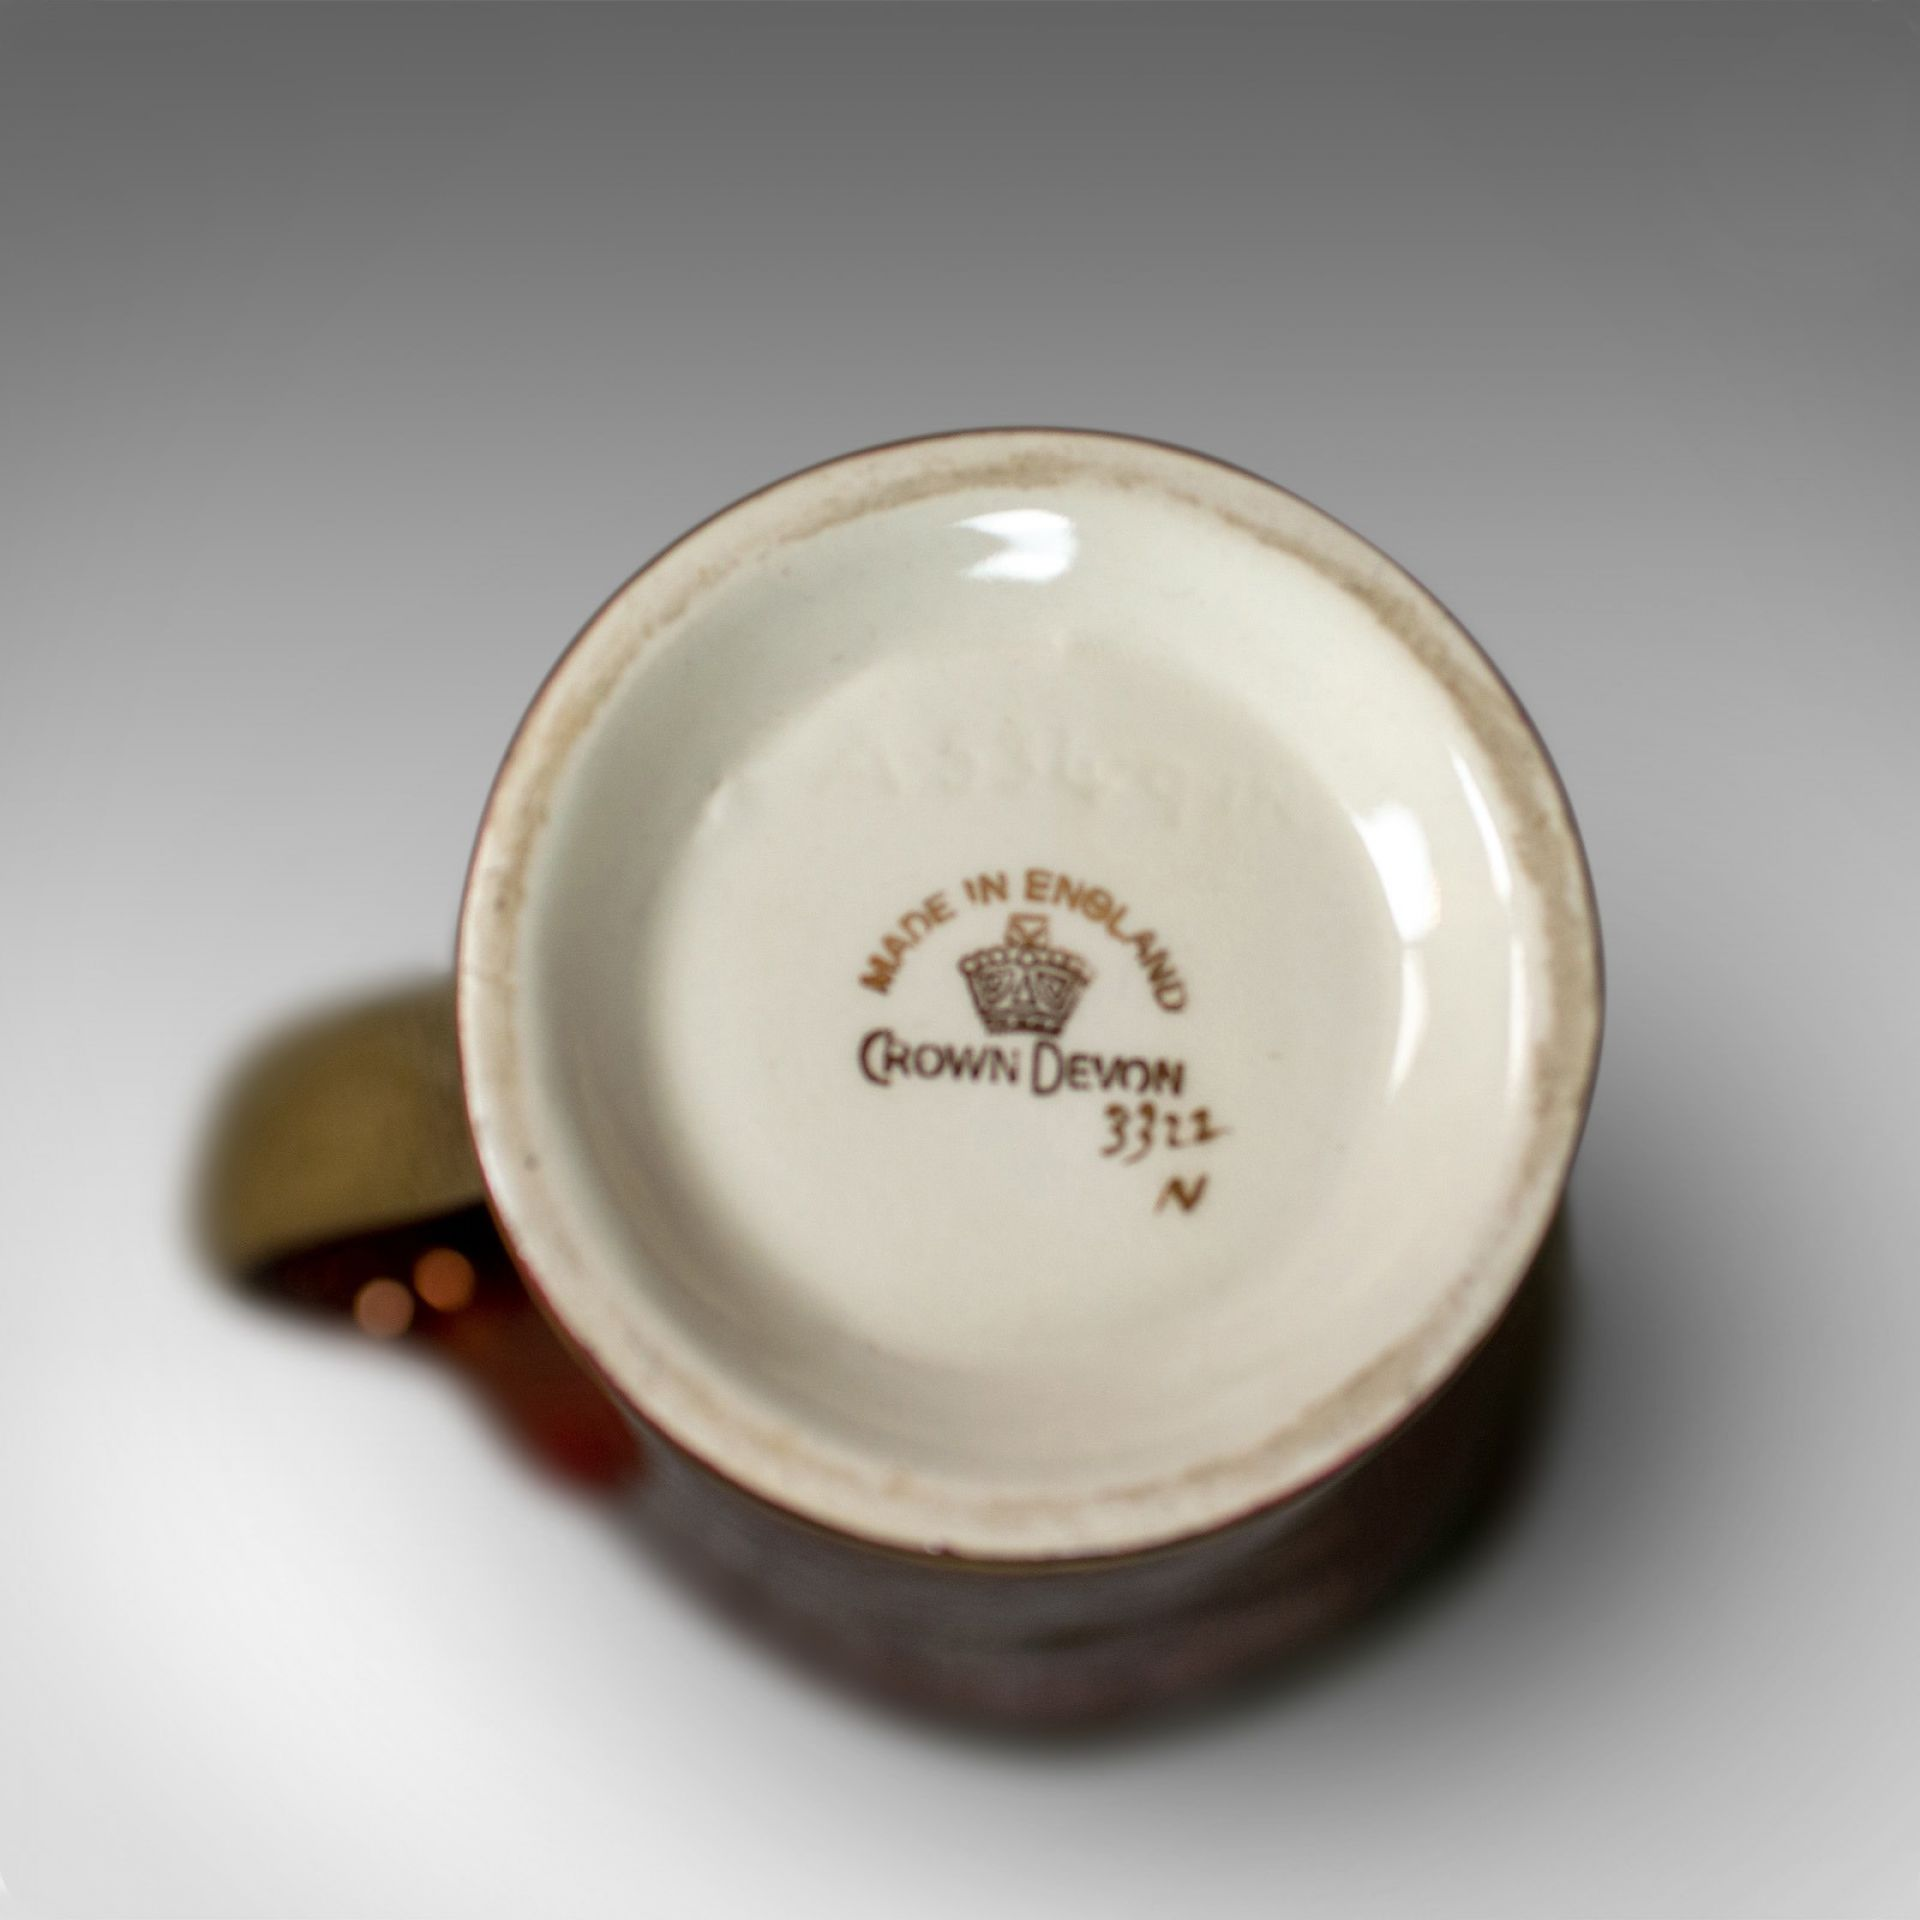 Vintage, Crown Devon Ewer, Decorative Jug, 3322, Rouge, Gold, Pearlescent C20th